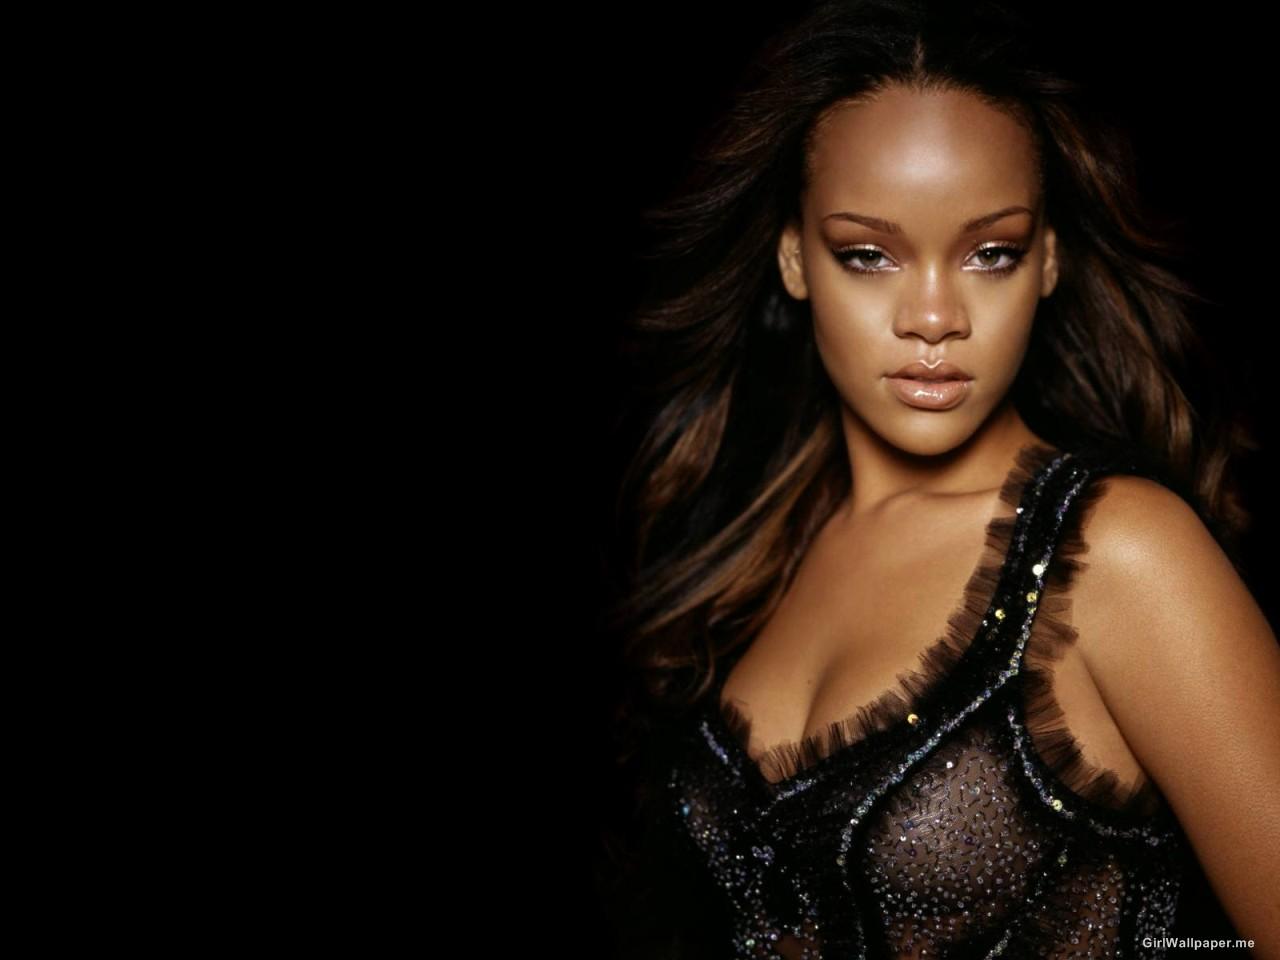 Rihanna-2012-+Rihanna-hair-style-2011+Rihanna-2012-+Rihanna-hair-style ...